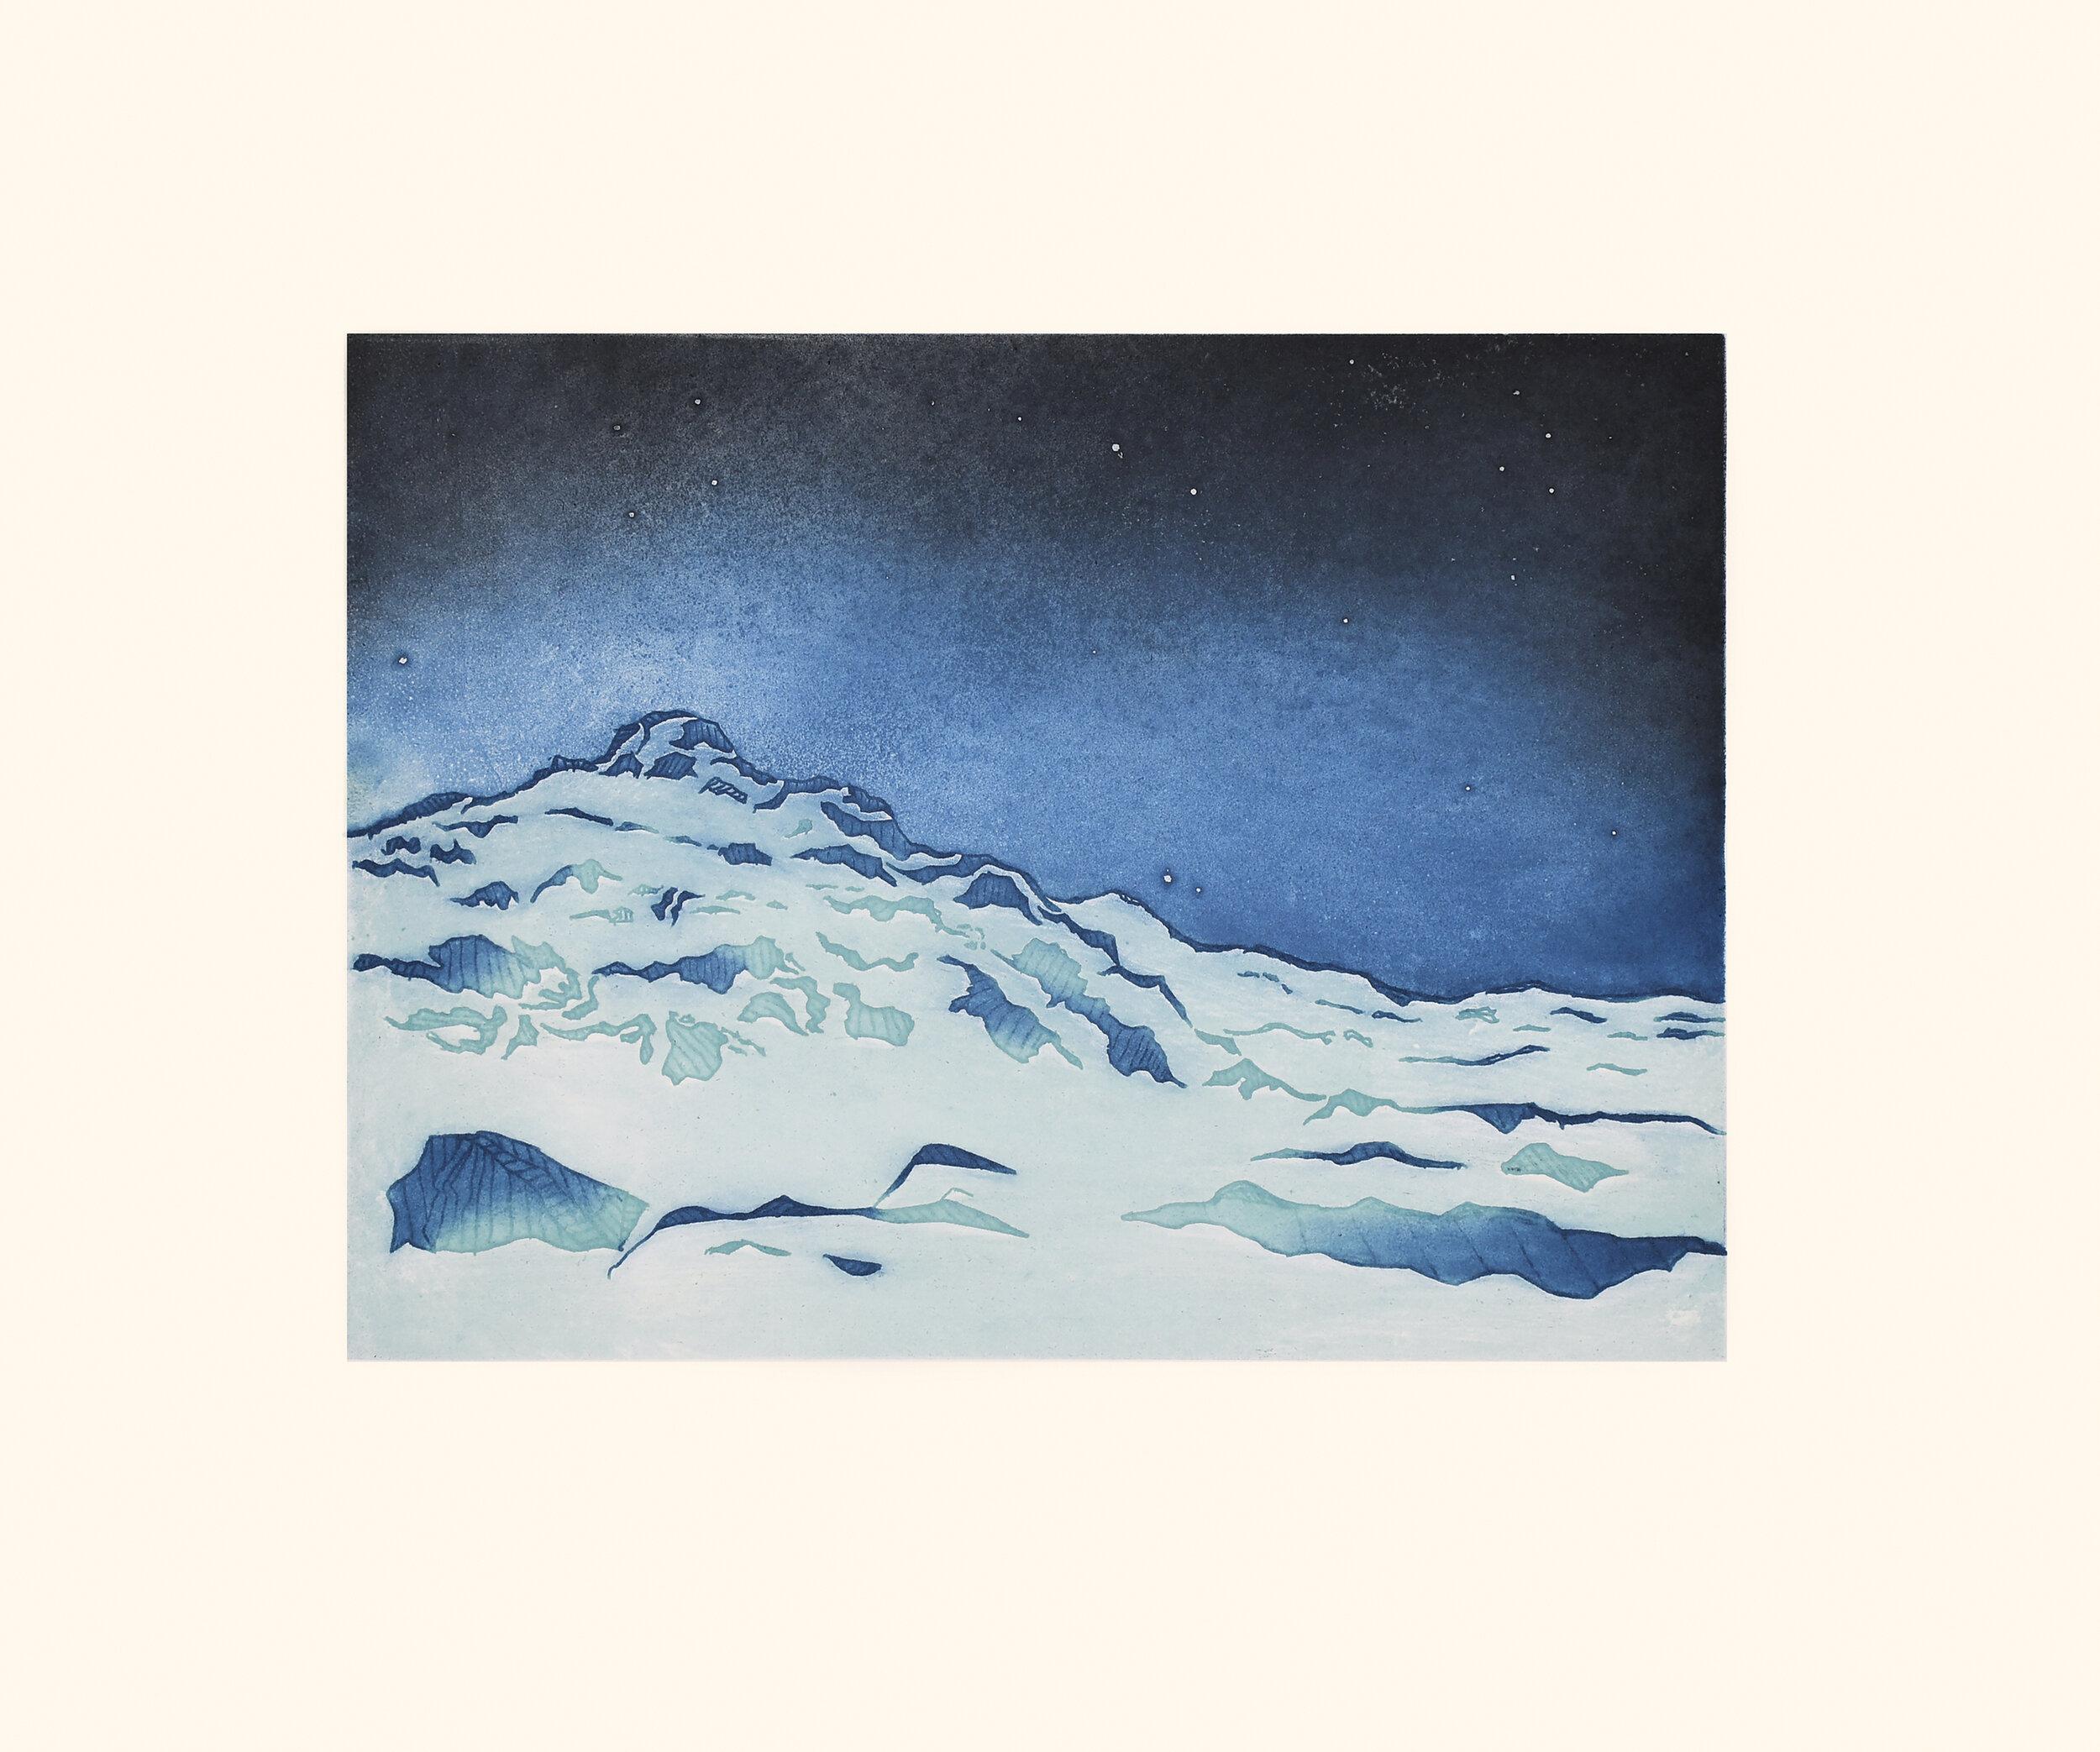 Silaqituq (Bright Evening) Nicotye Samayualie Inuit Etching & Aquatint Cape Dorset Print Collection 2020